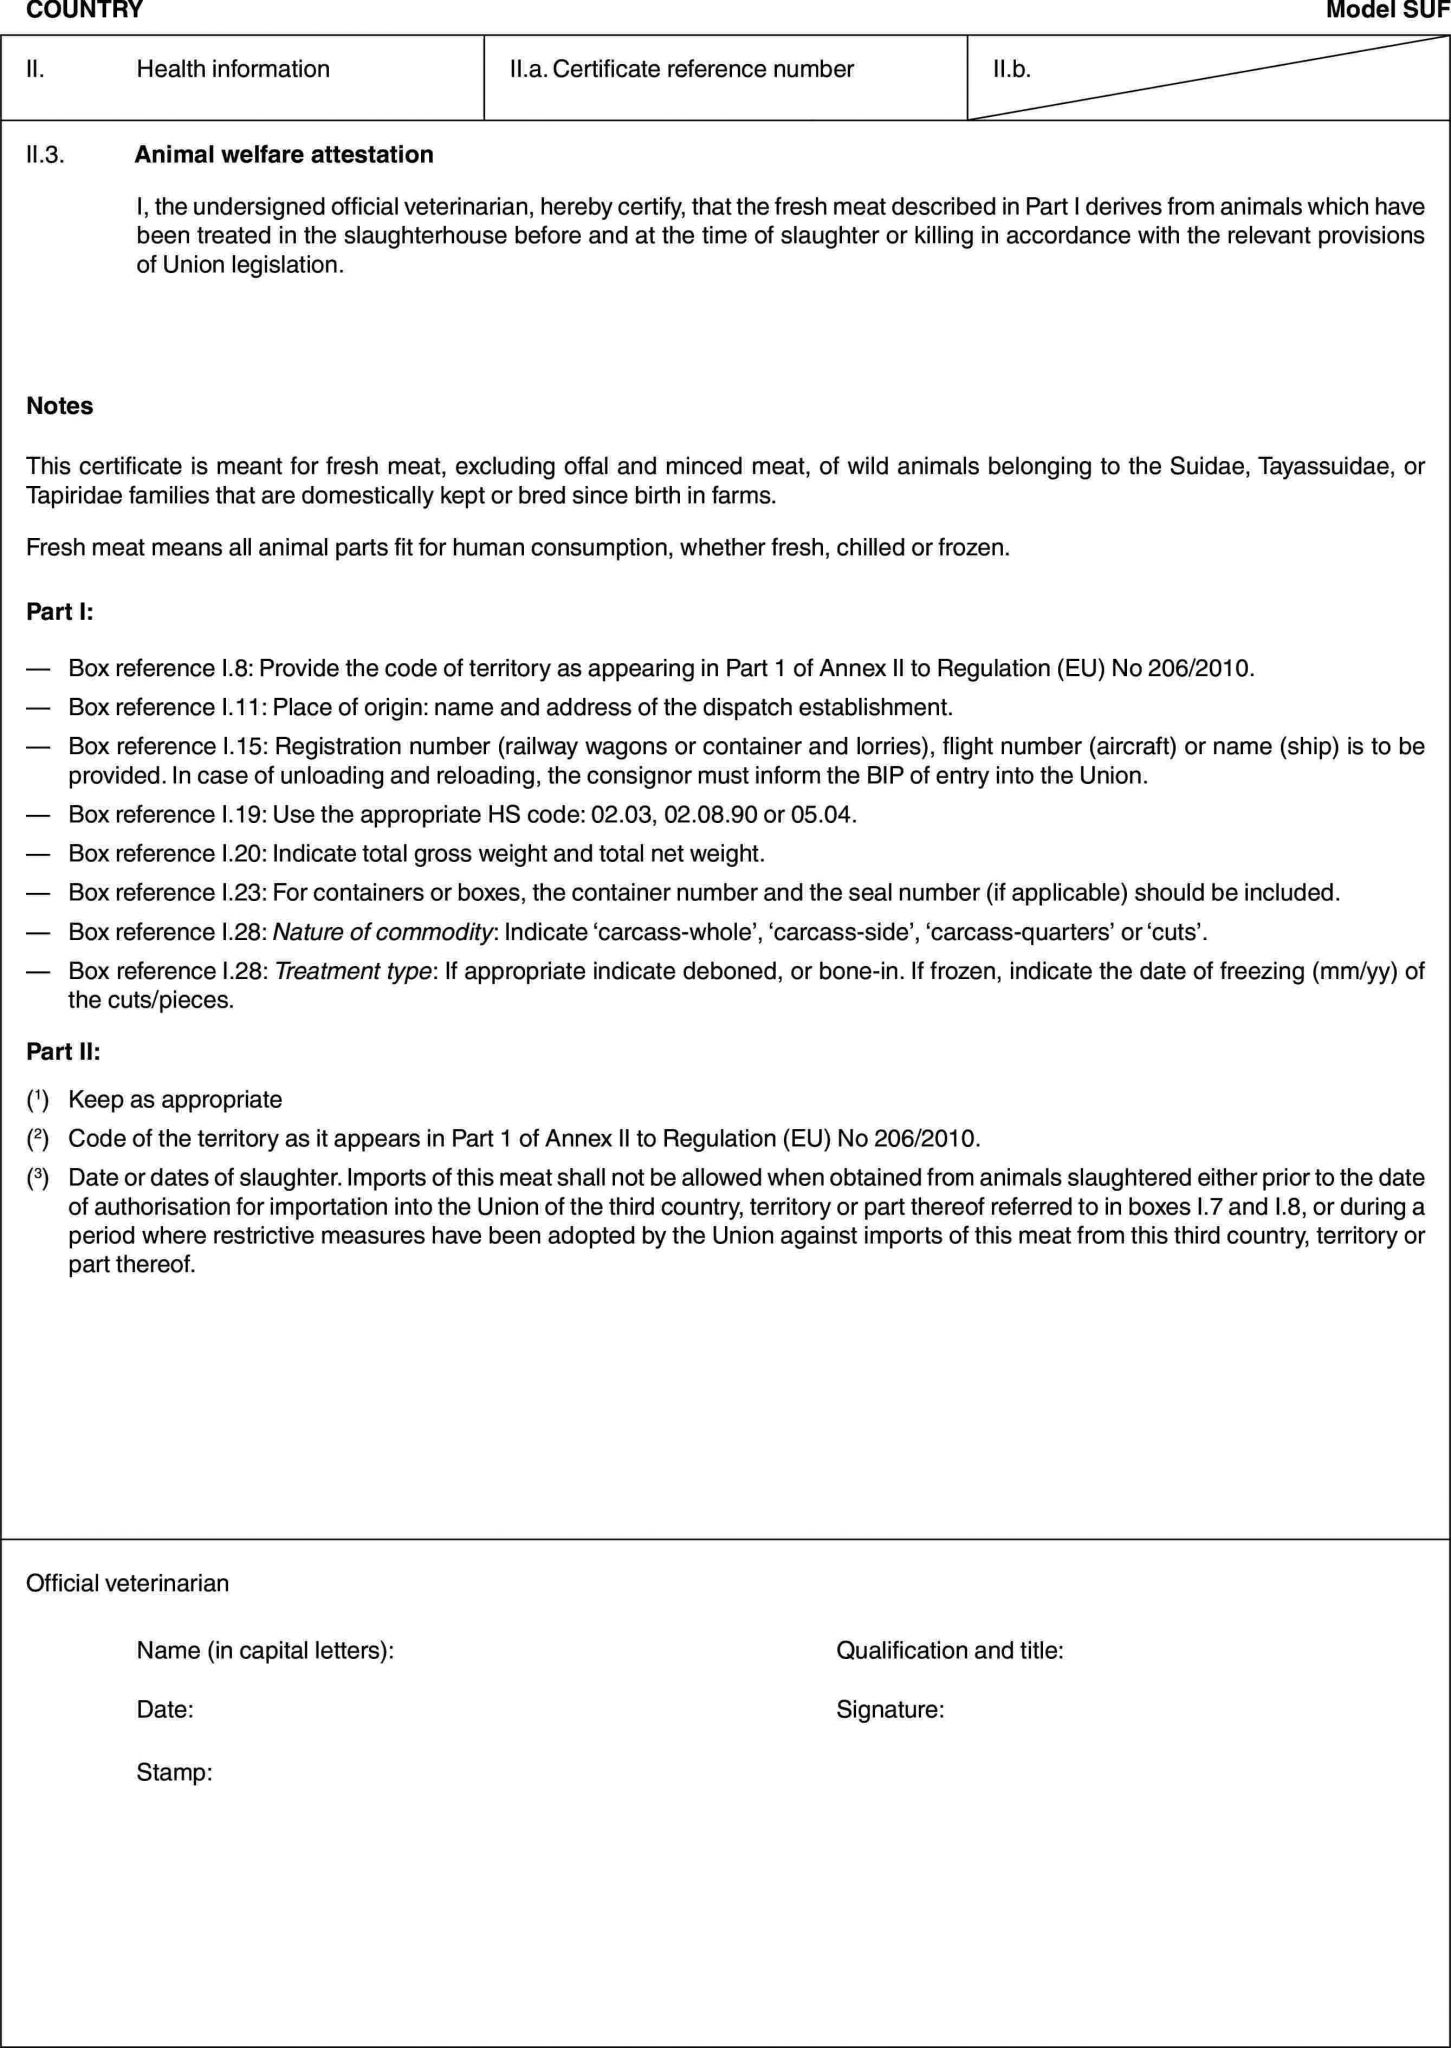 Neutralization Reactions Worksheet together with Eur Lex R0206 En Eur Lex